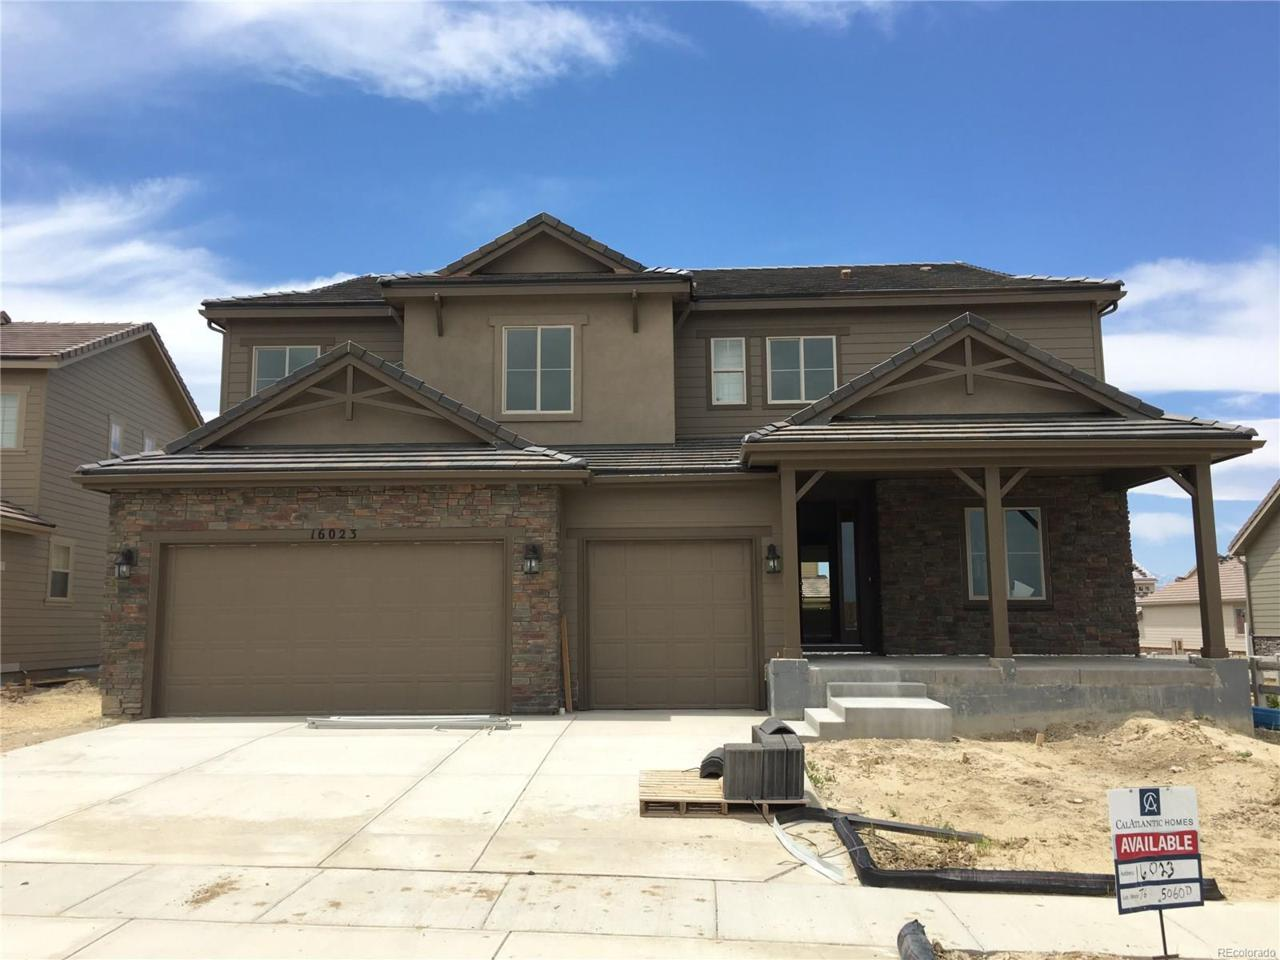 16023 Swan Mountain Drive, Broomfield, CO 80023 (MLS #6623713) :: 8z Real Estate